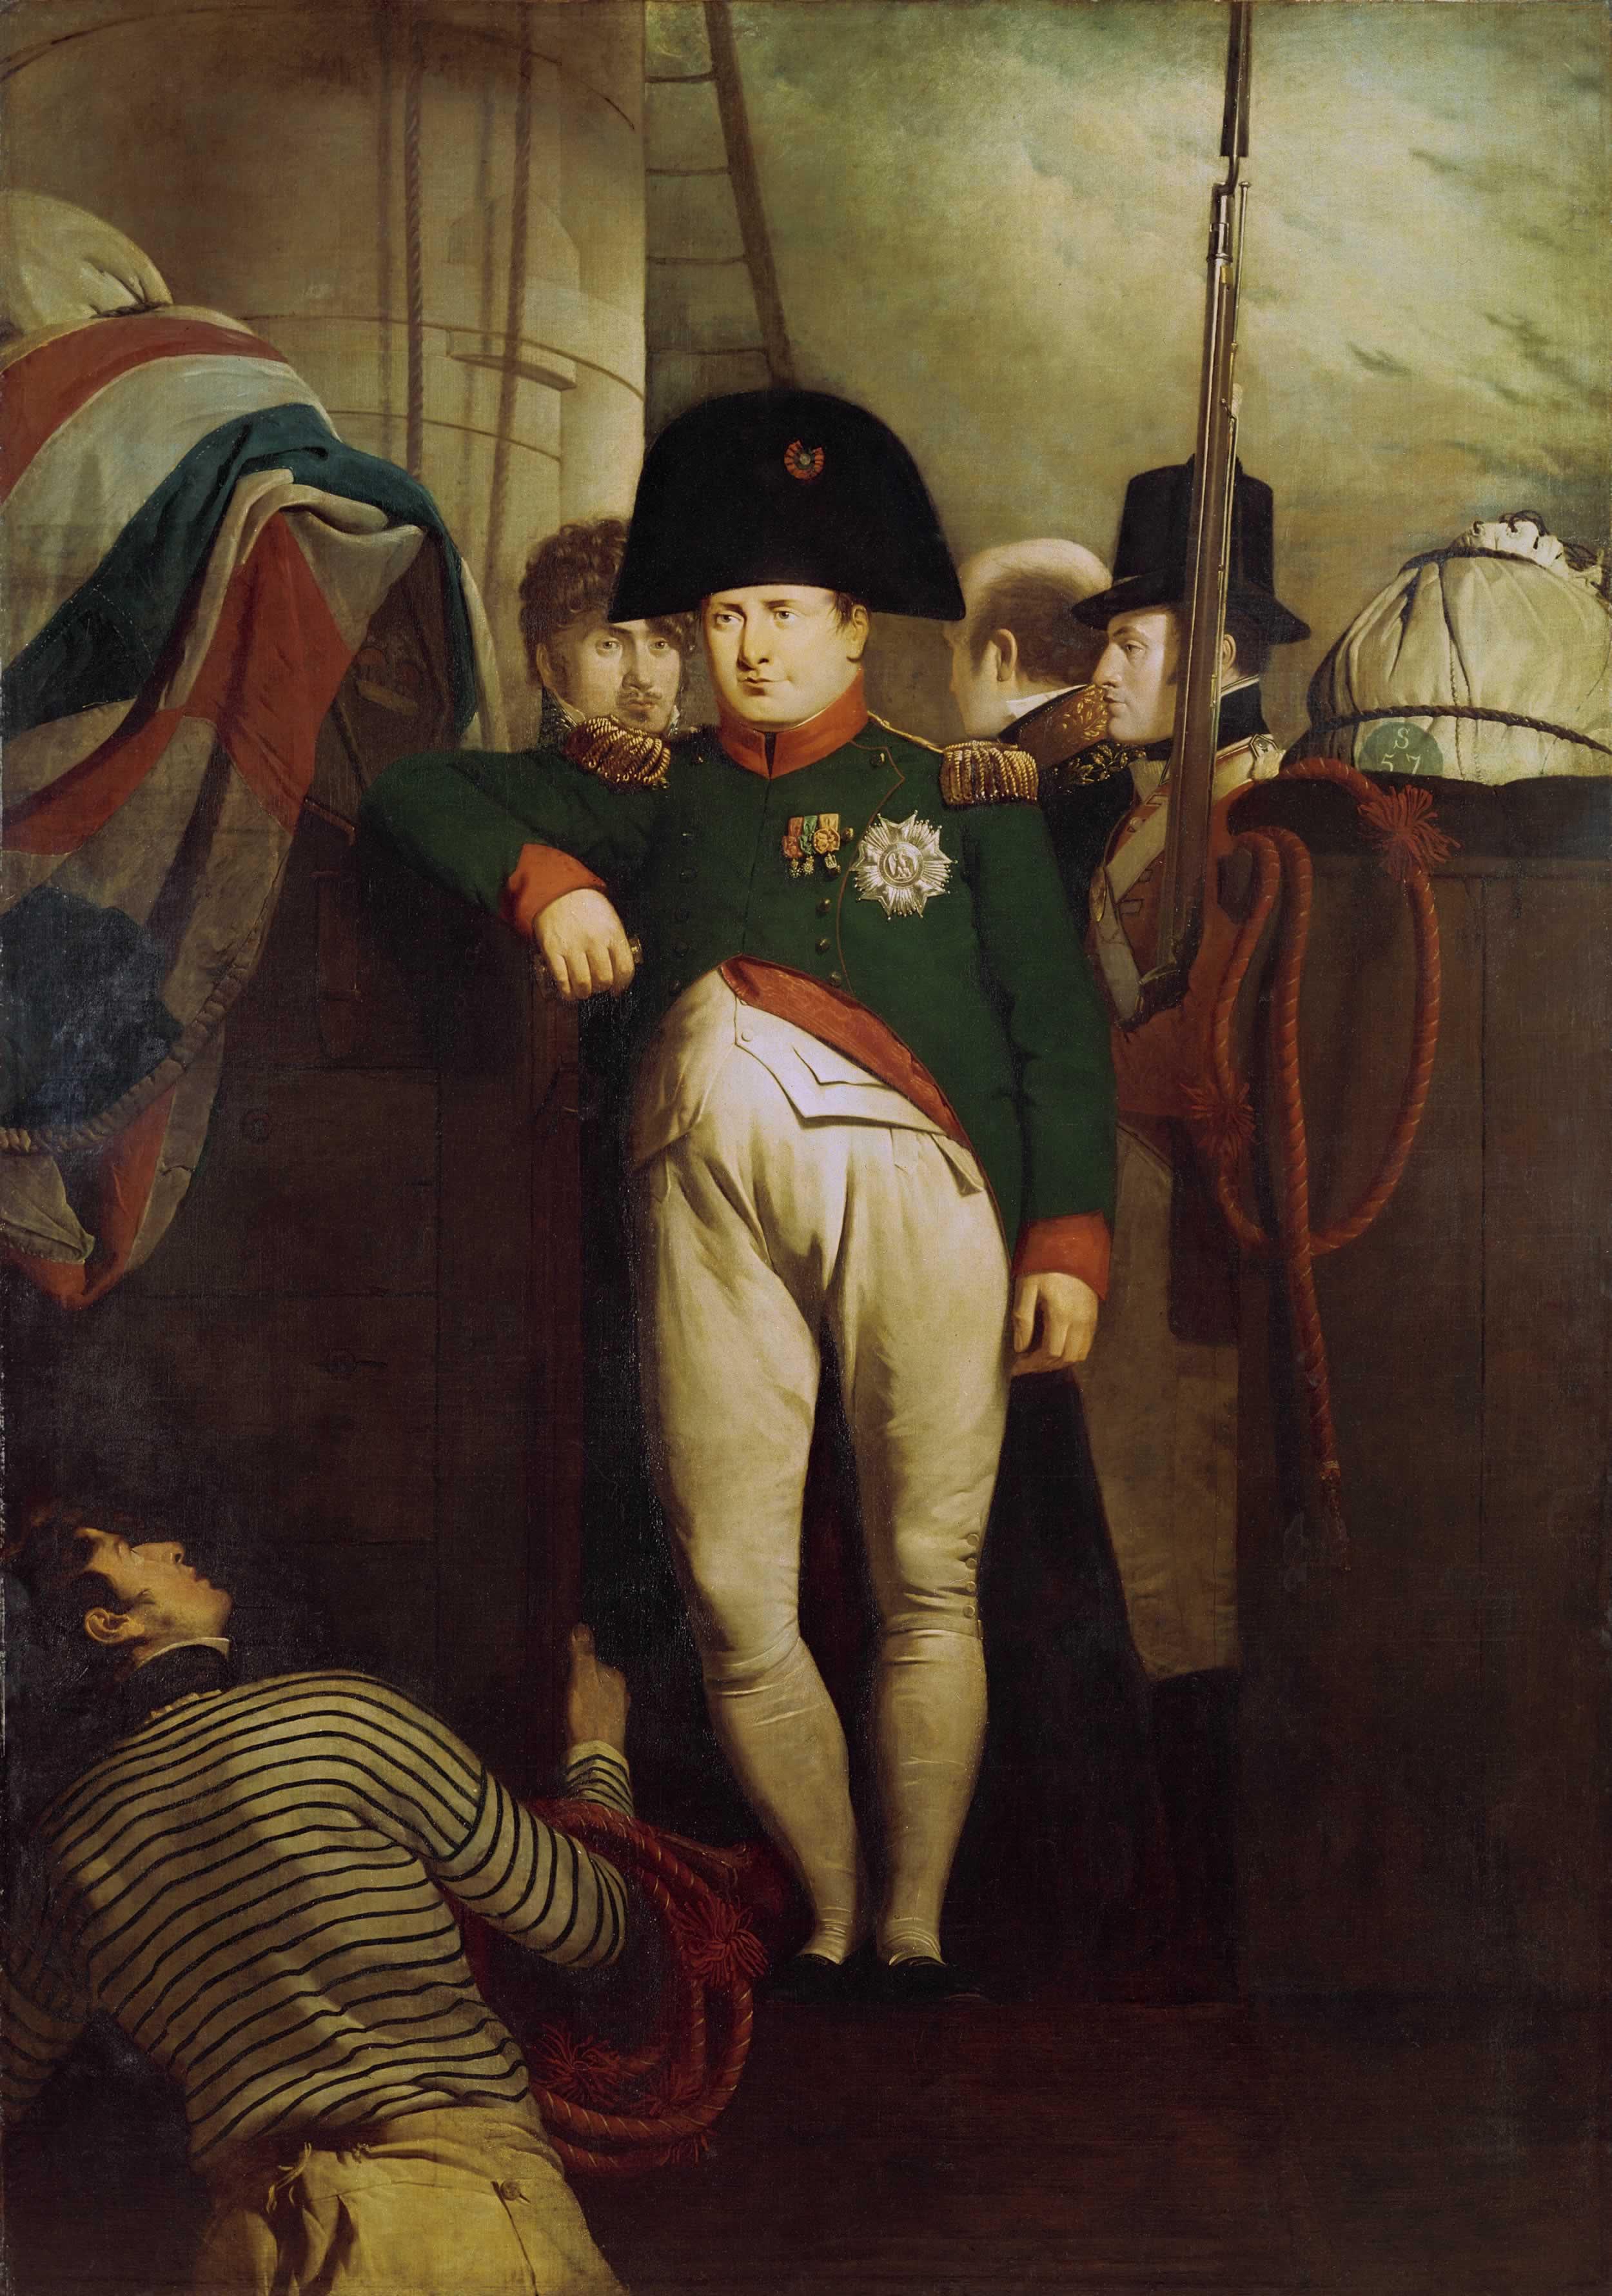 http://upload.wikimedia.org/wikipedia/commons/a/a8/Eastlake_-_Napoleon_on_the_Bellerophon.jpg